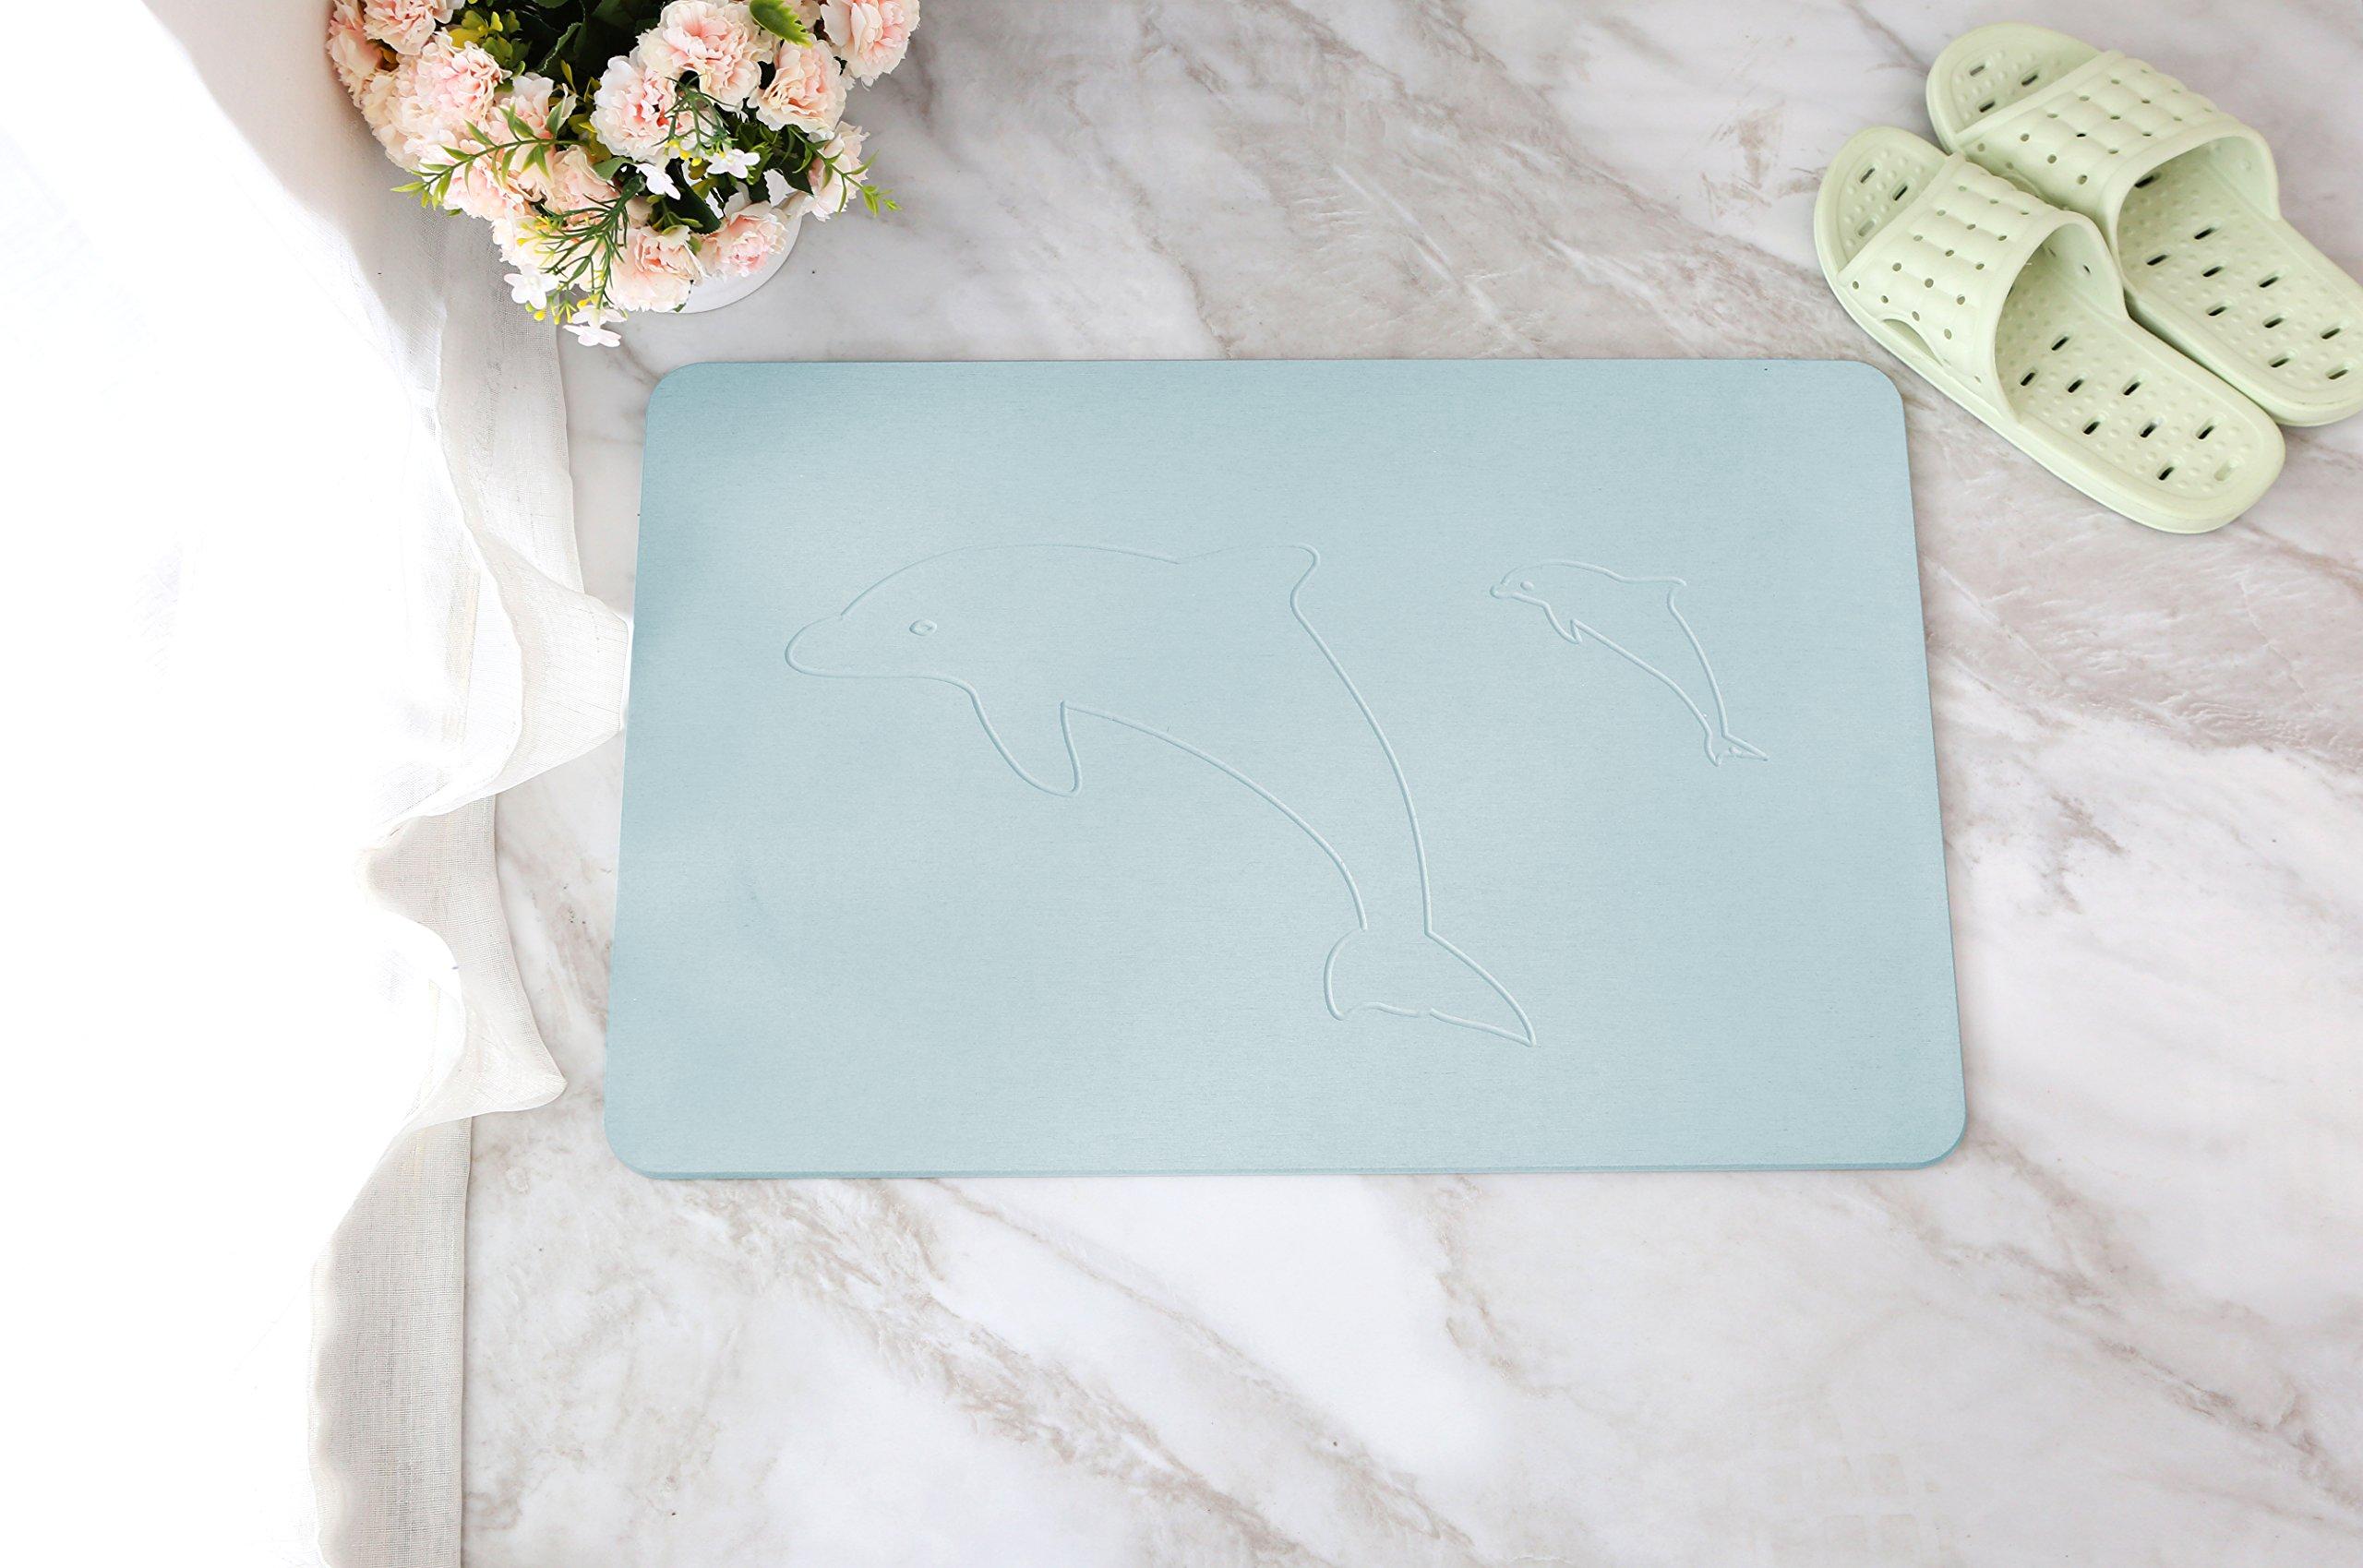 "Alpha Home Diatomaceous Earth Bath Mat Non-Slip Bathtub Mat Absorbent Fast Drying Antibacterial Bathroom Floor Rugs Carpet - 24"" x 15"", Blue"